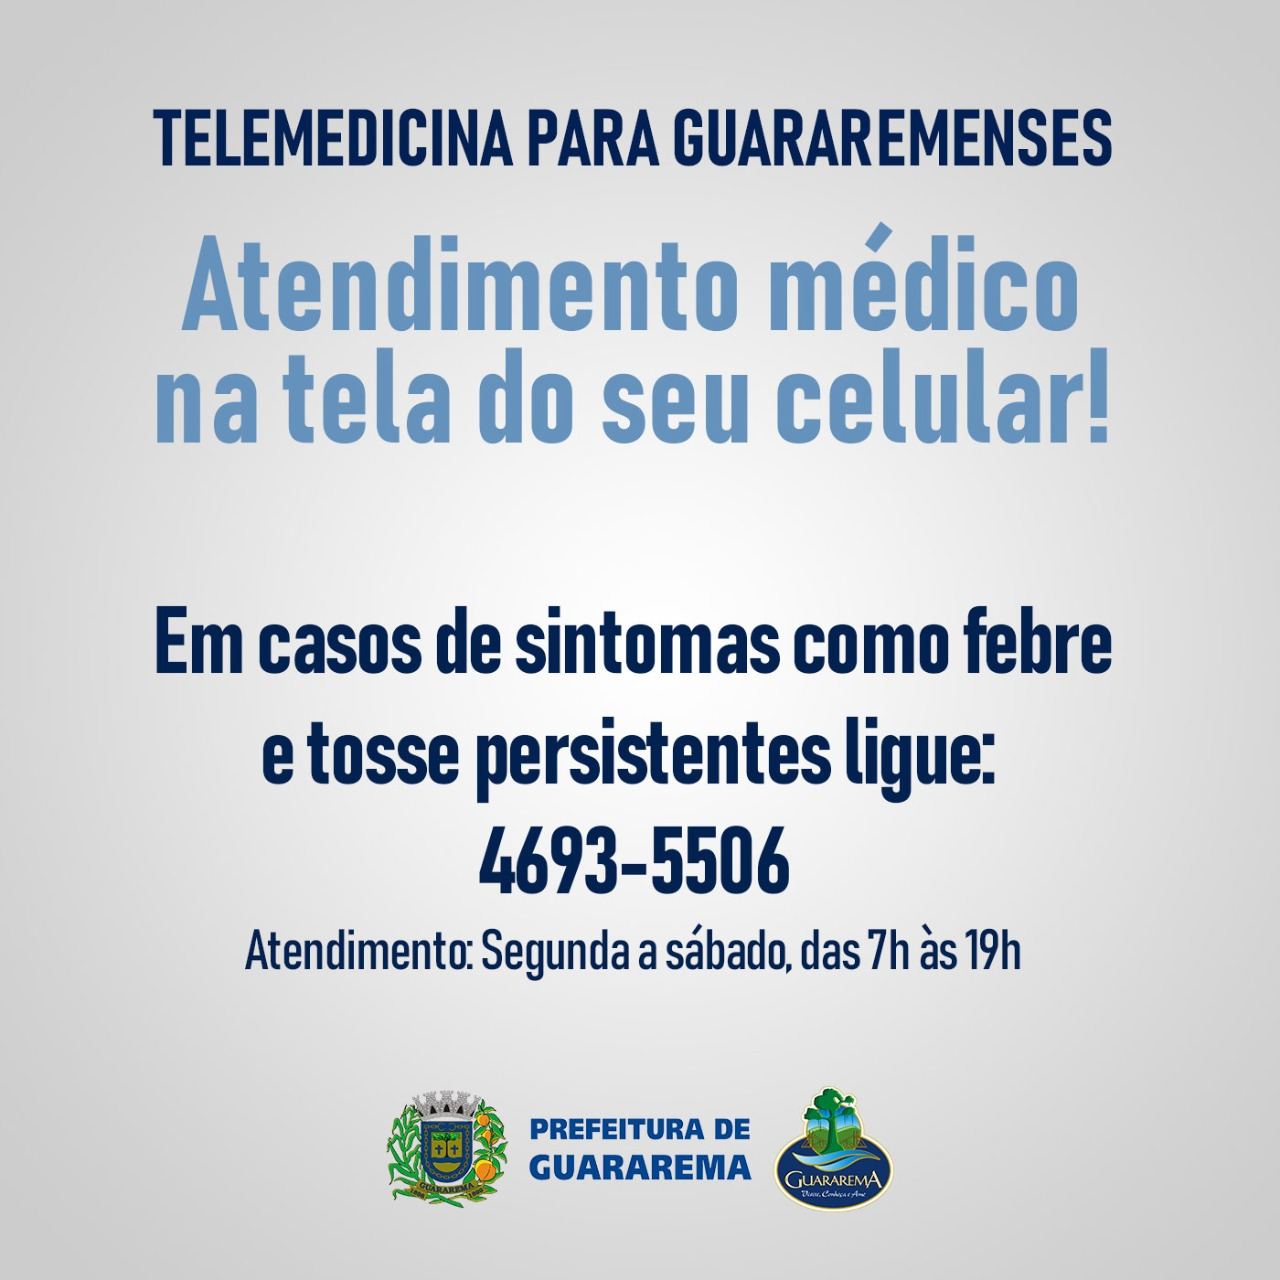 Prefeitura implanta telemedicina para casos suspeitos de Coronavírus